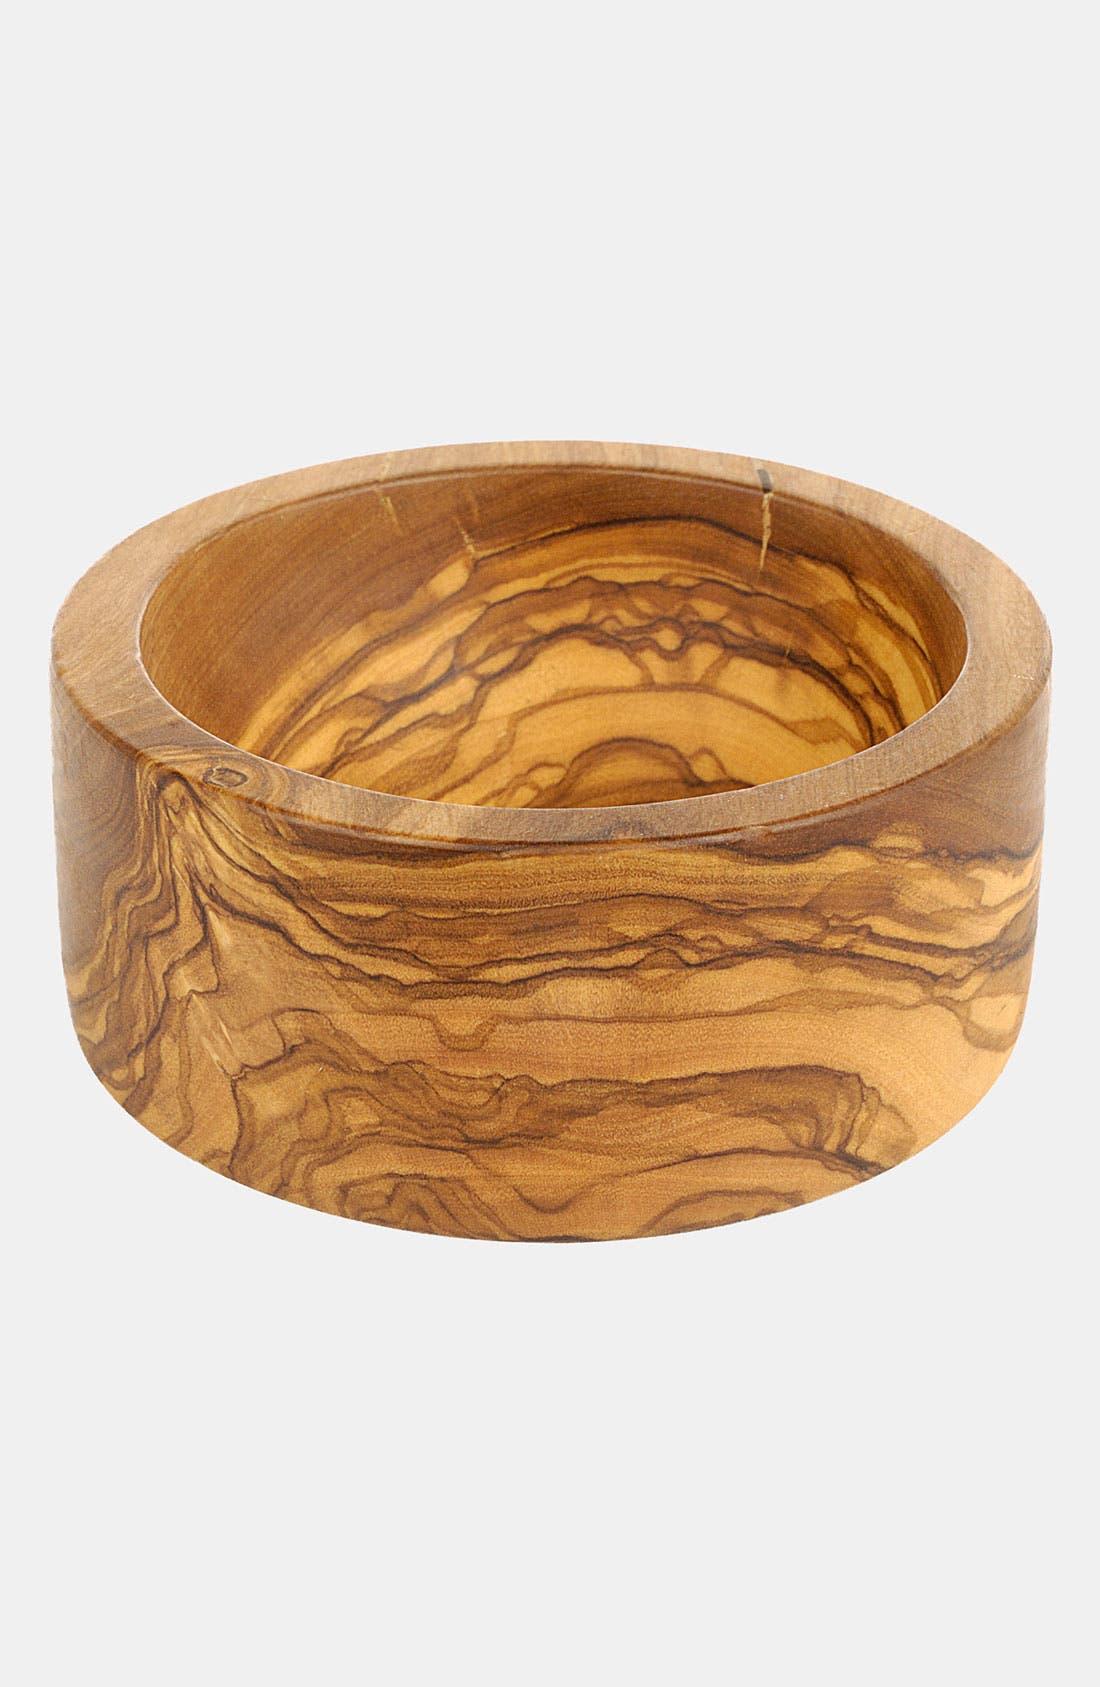 Main Image - Bérard Olive Wood Pitch Bowl